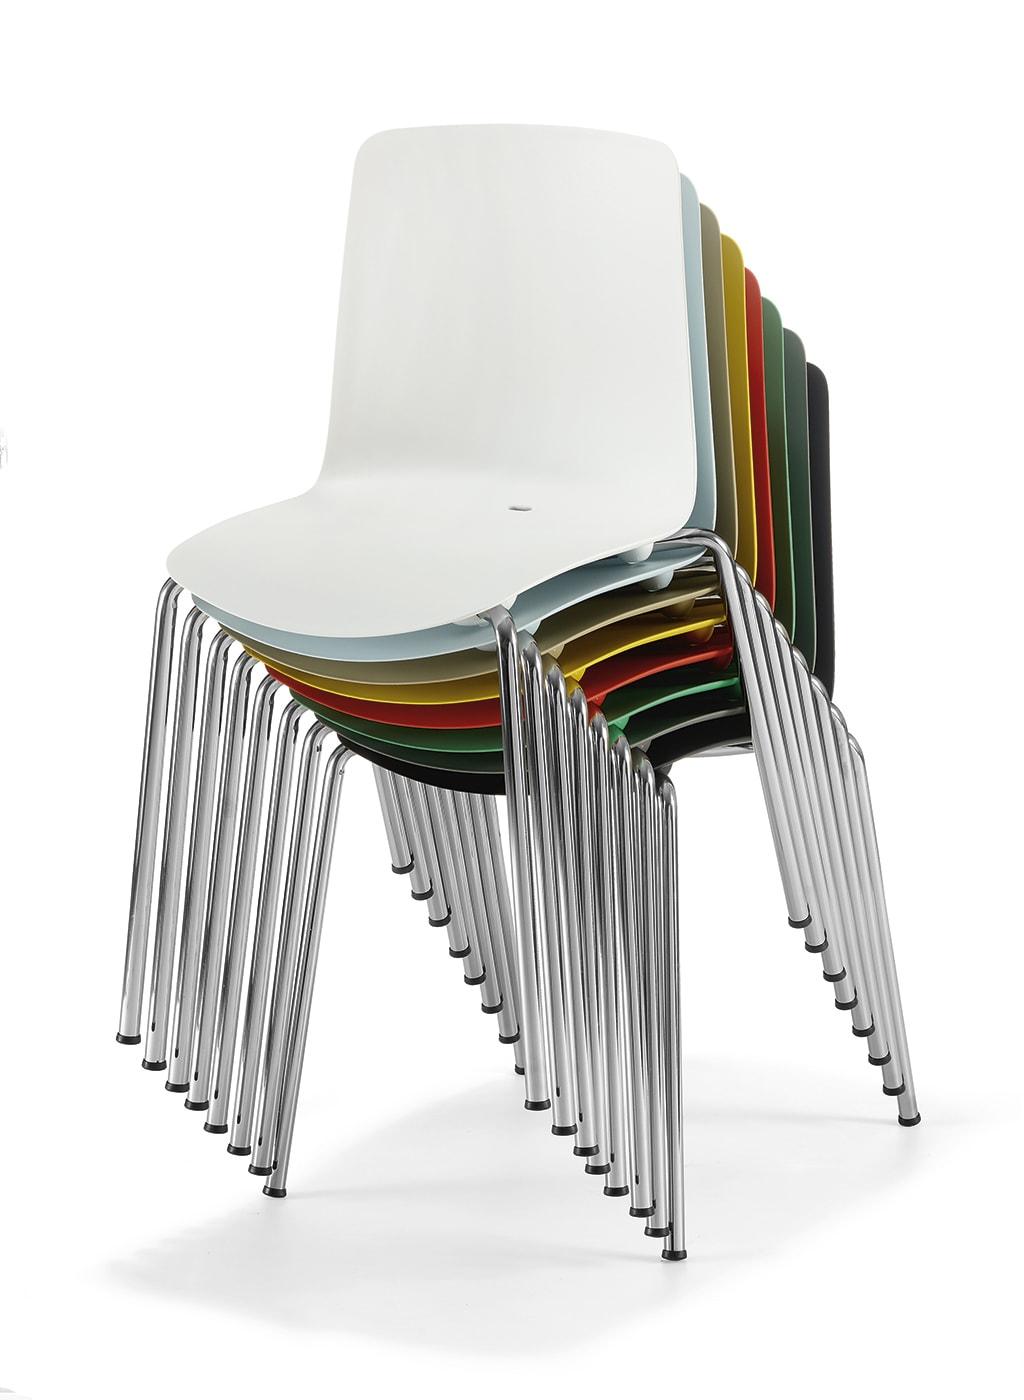 COLOS Vesper sedia impilabile